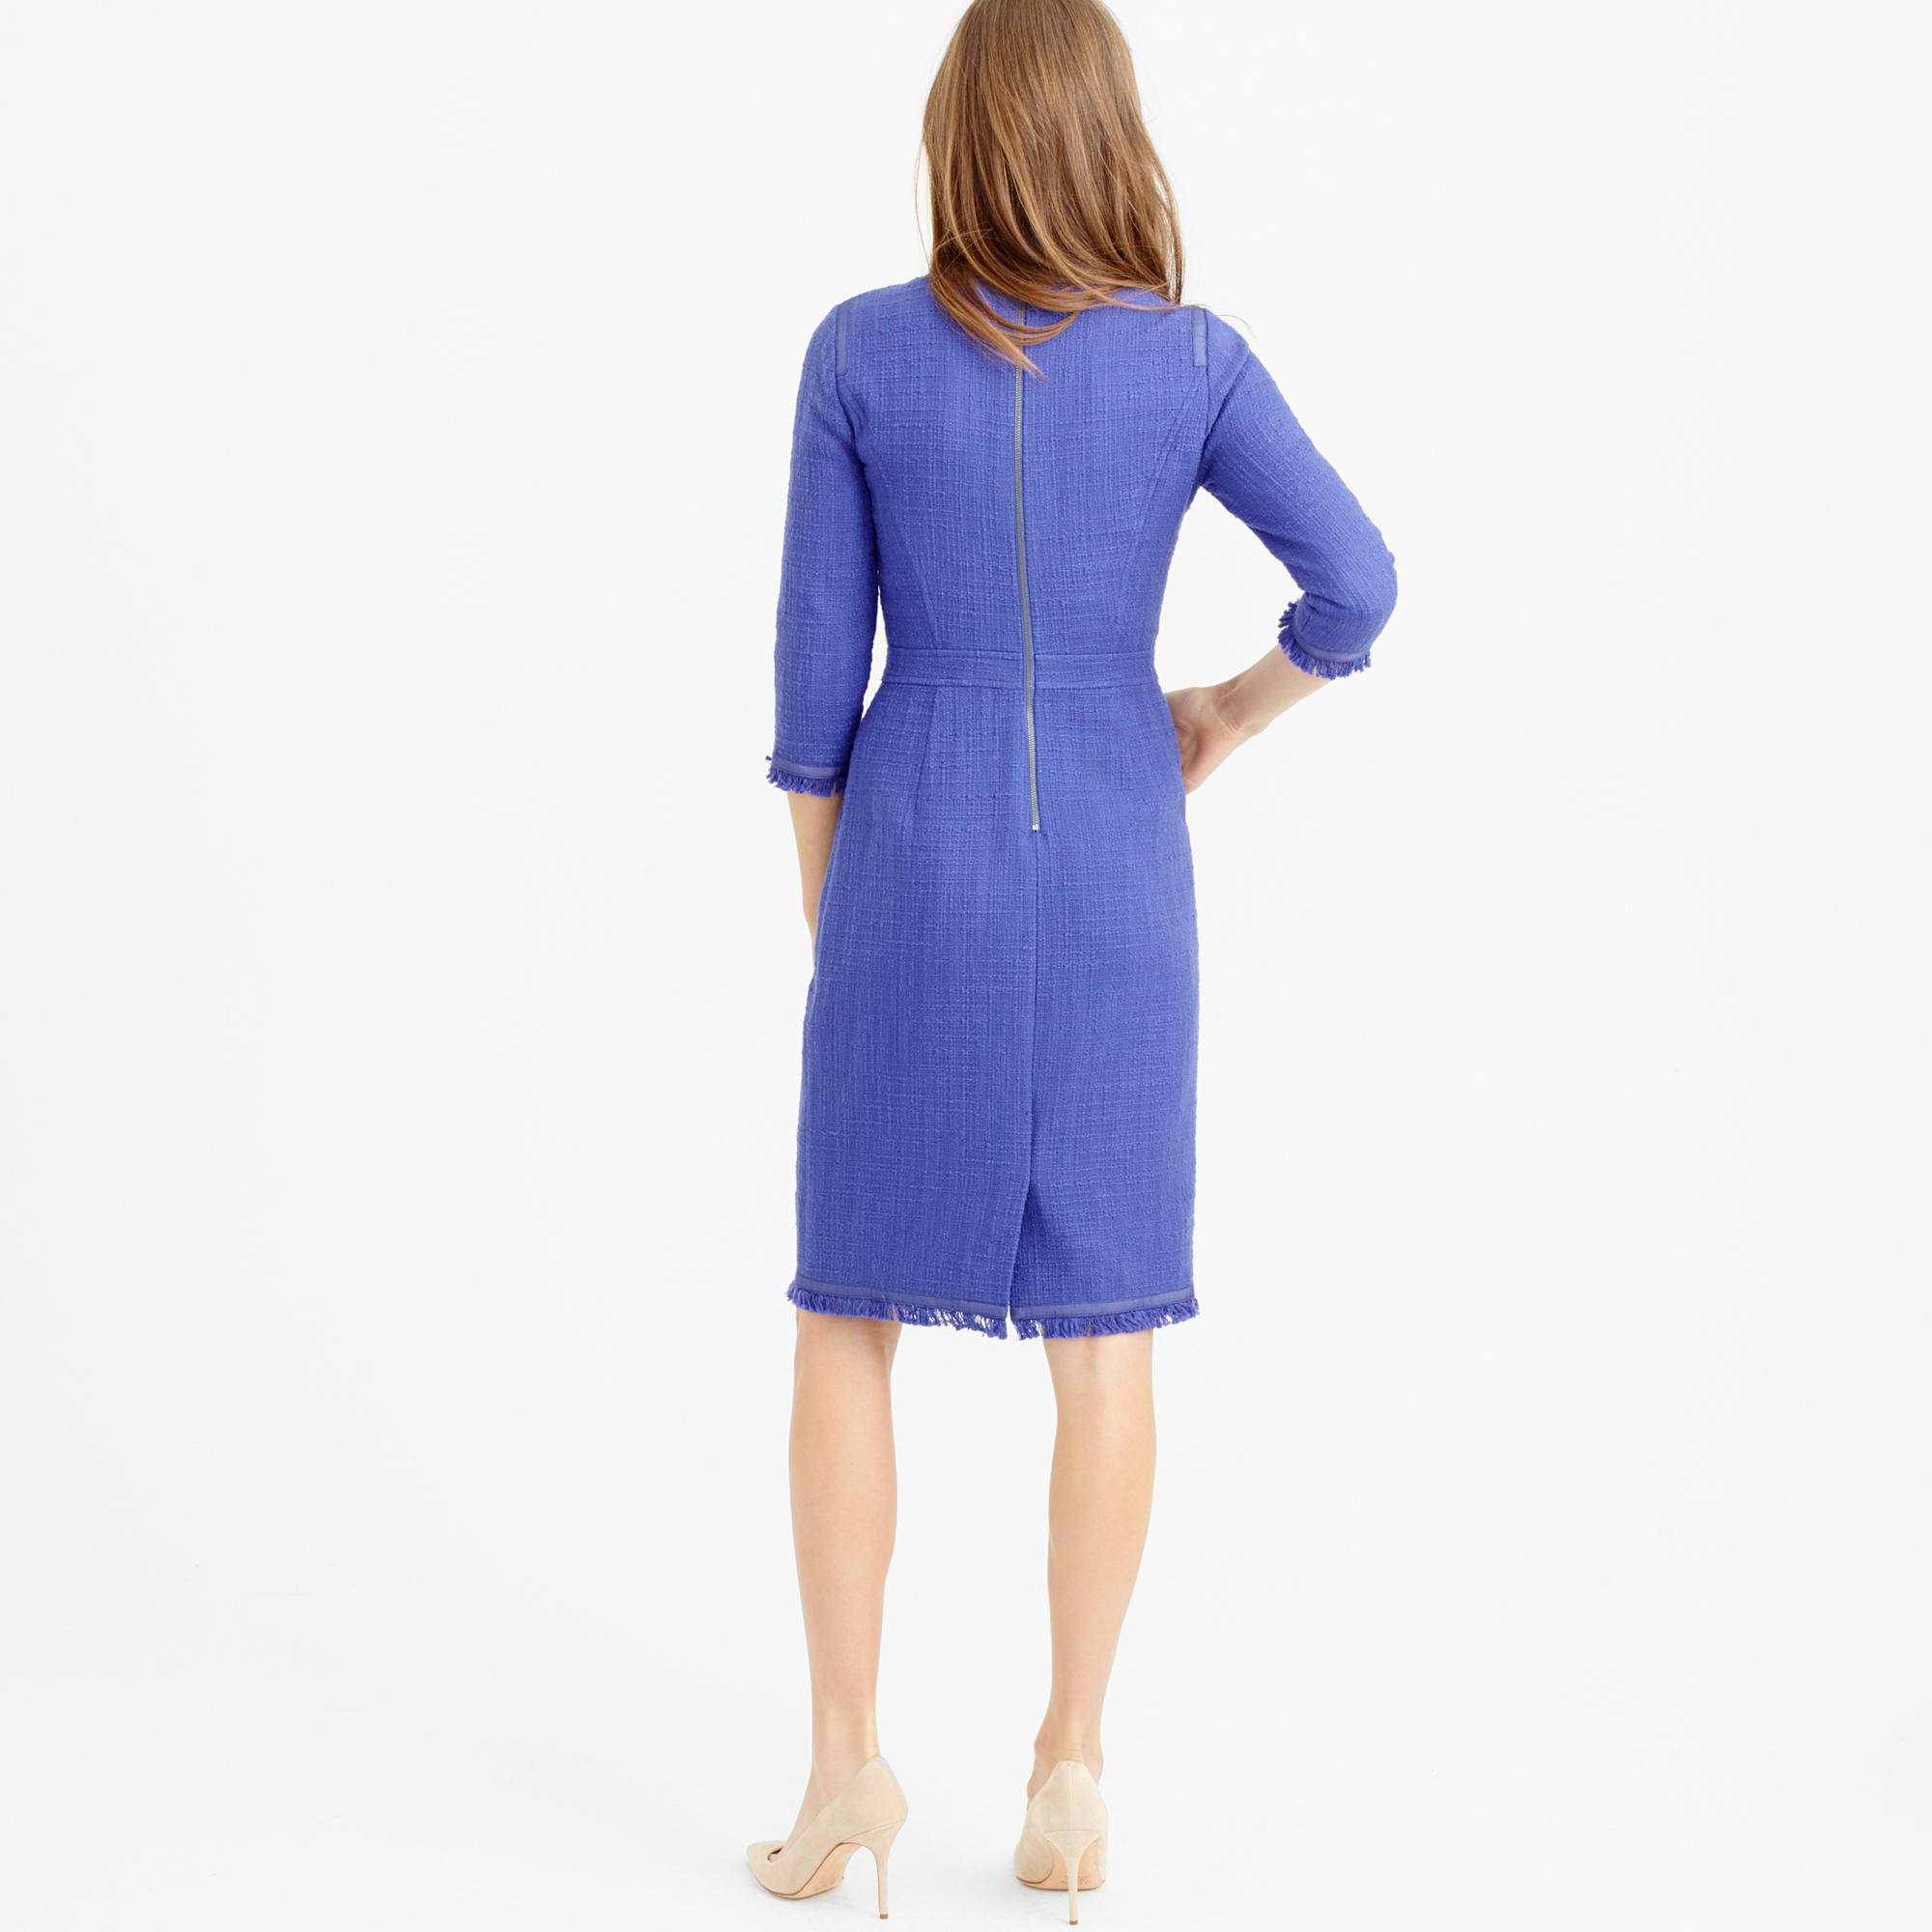 d3526df16b Lyst - J.Crew Petite Long-sleeve Tweed Dress With Fringe in Blue